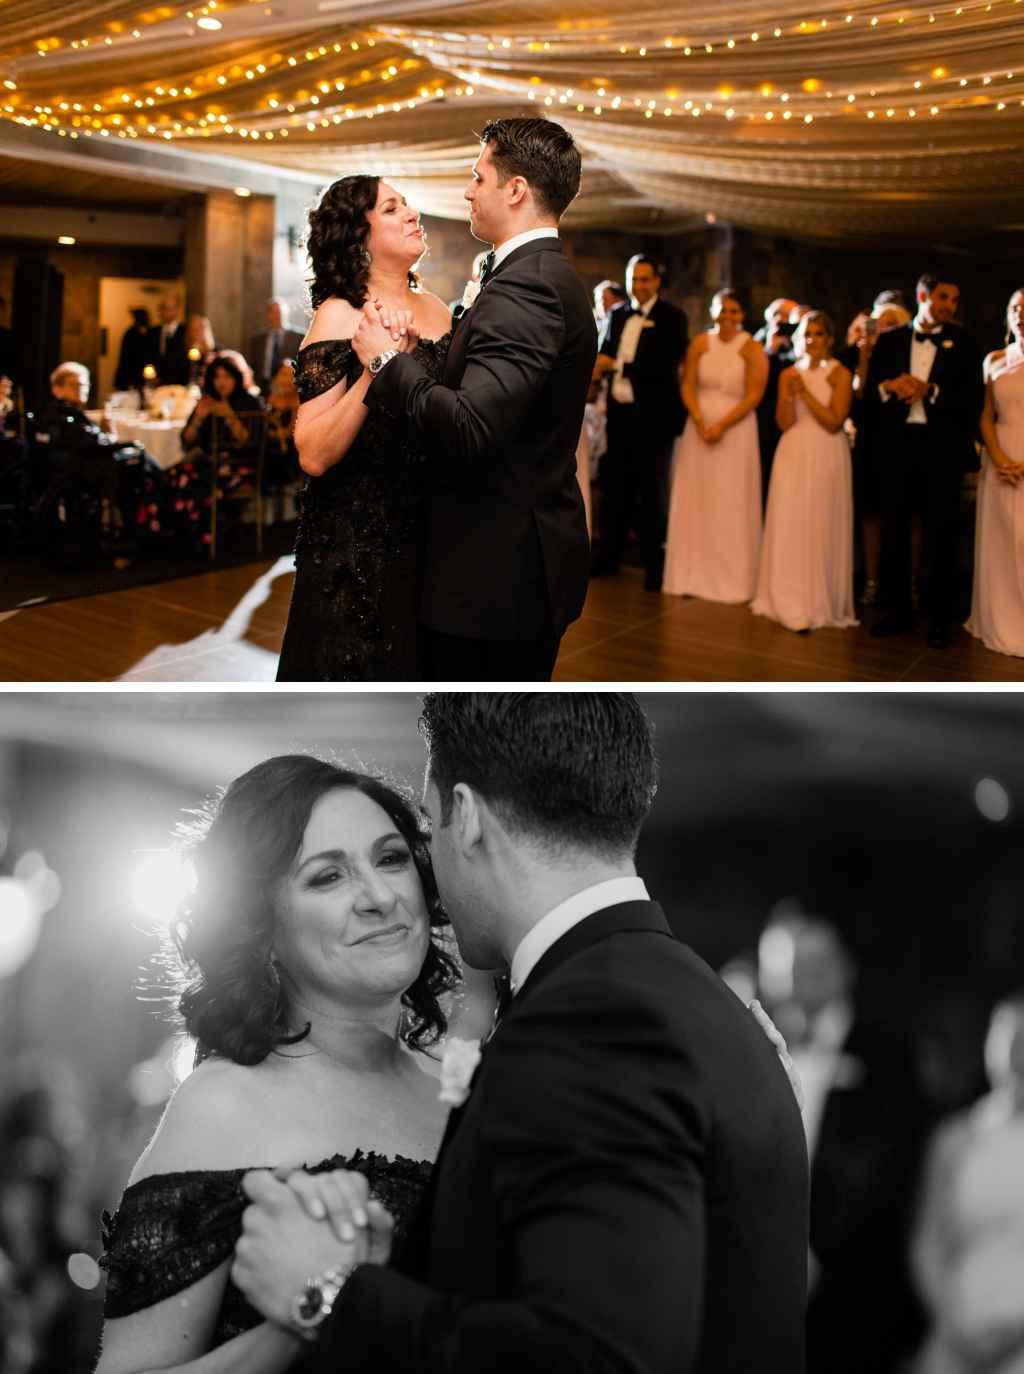 parent dance photos tappan hill wedding hudson valley wedding photographer